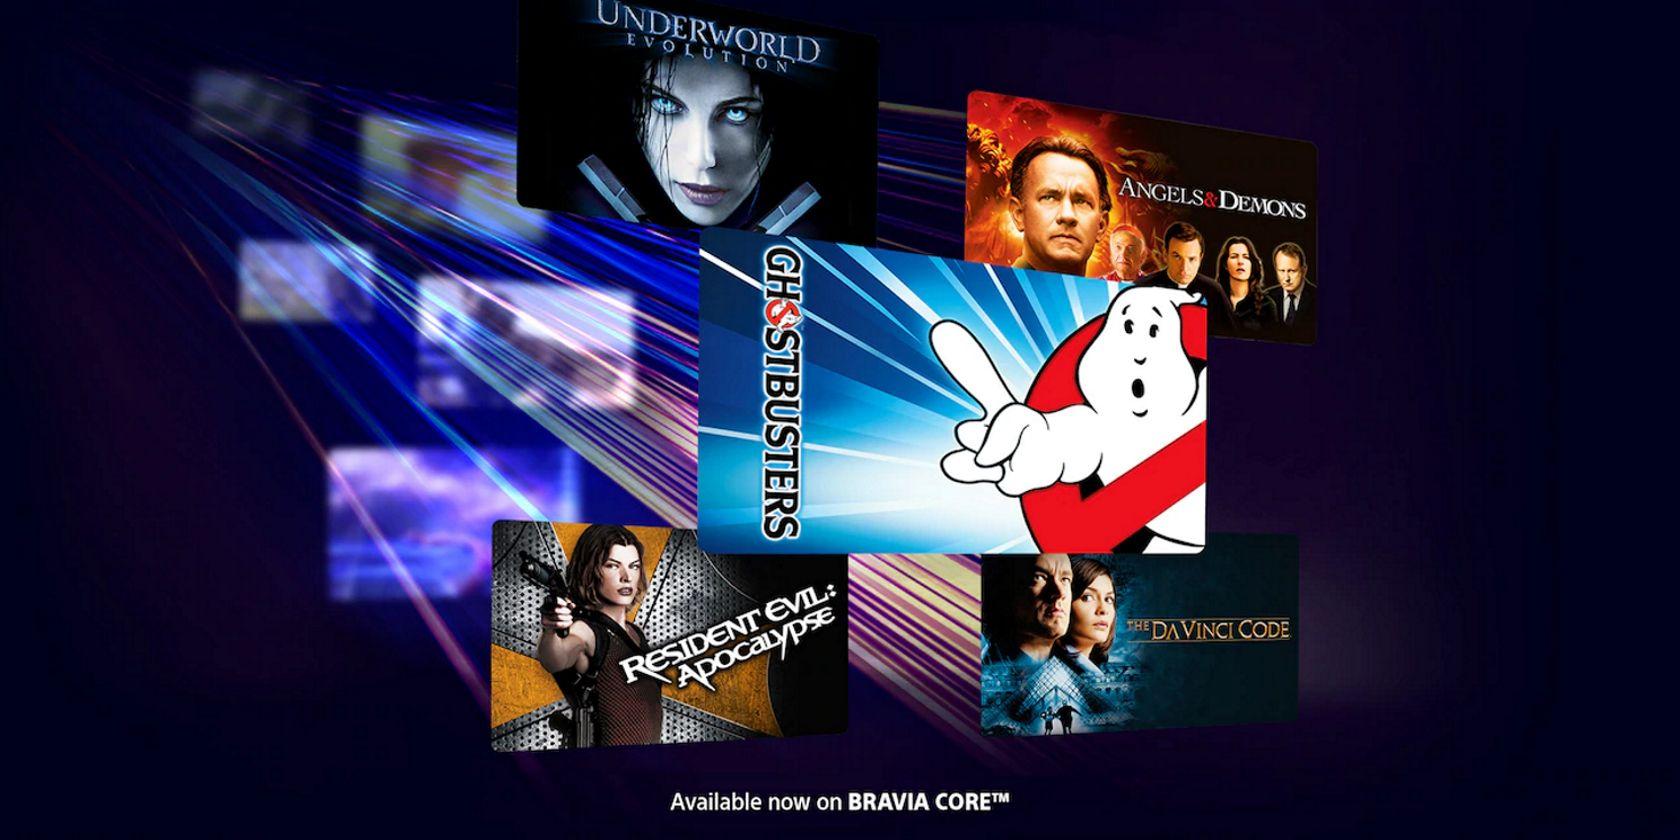 Sony Announces Bravia Core, a Near-Lossless Streaming Service